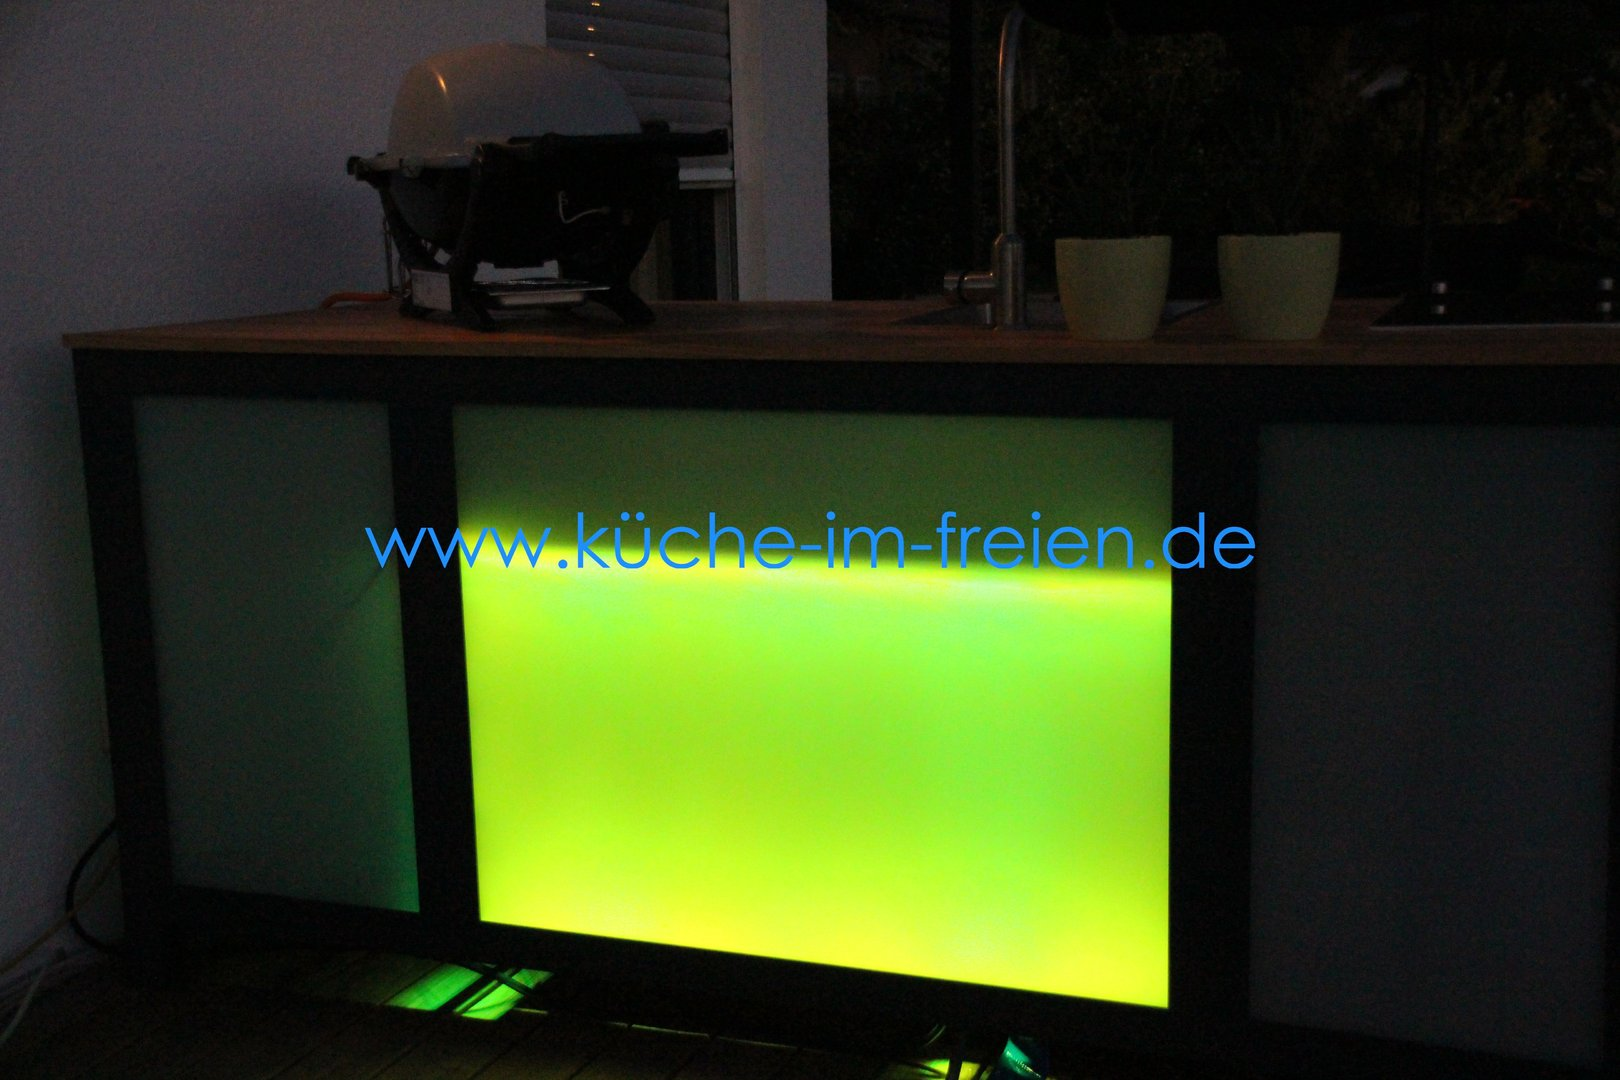 Outdoor Küche Beleuchtung : Led beleuchtung für outdoor küche